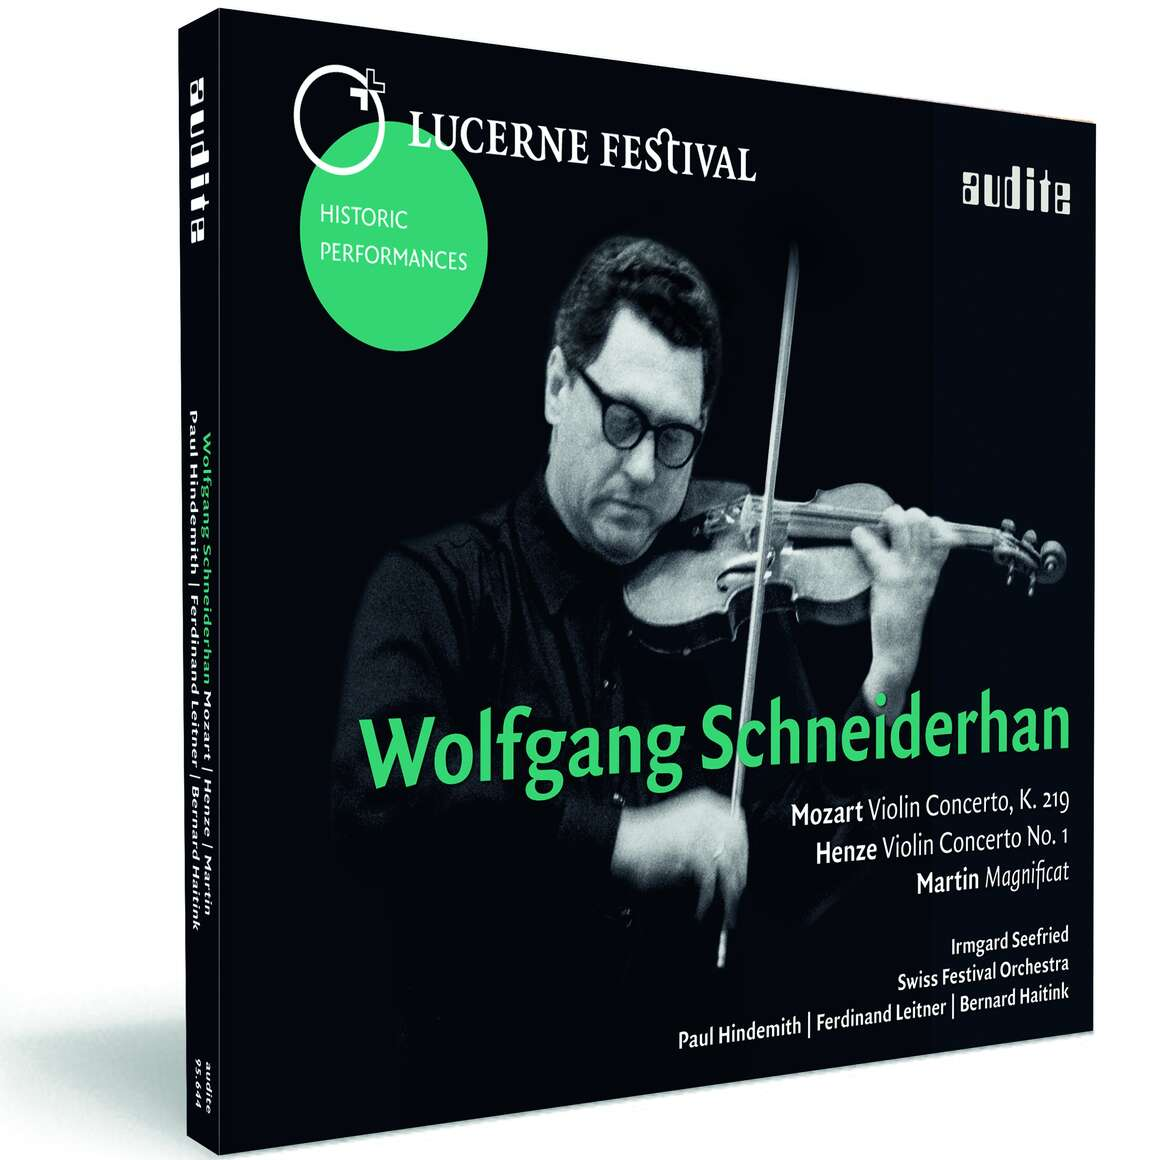 Wolfgang Schneiderhan plays Mozart, Henze & Martin